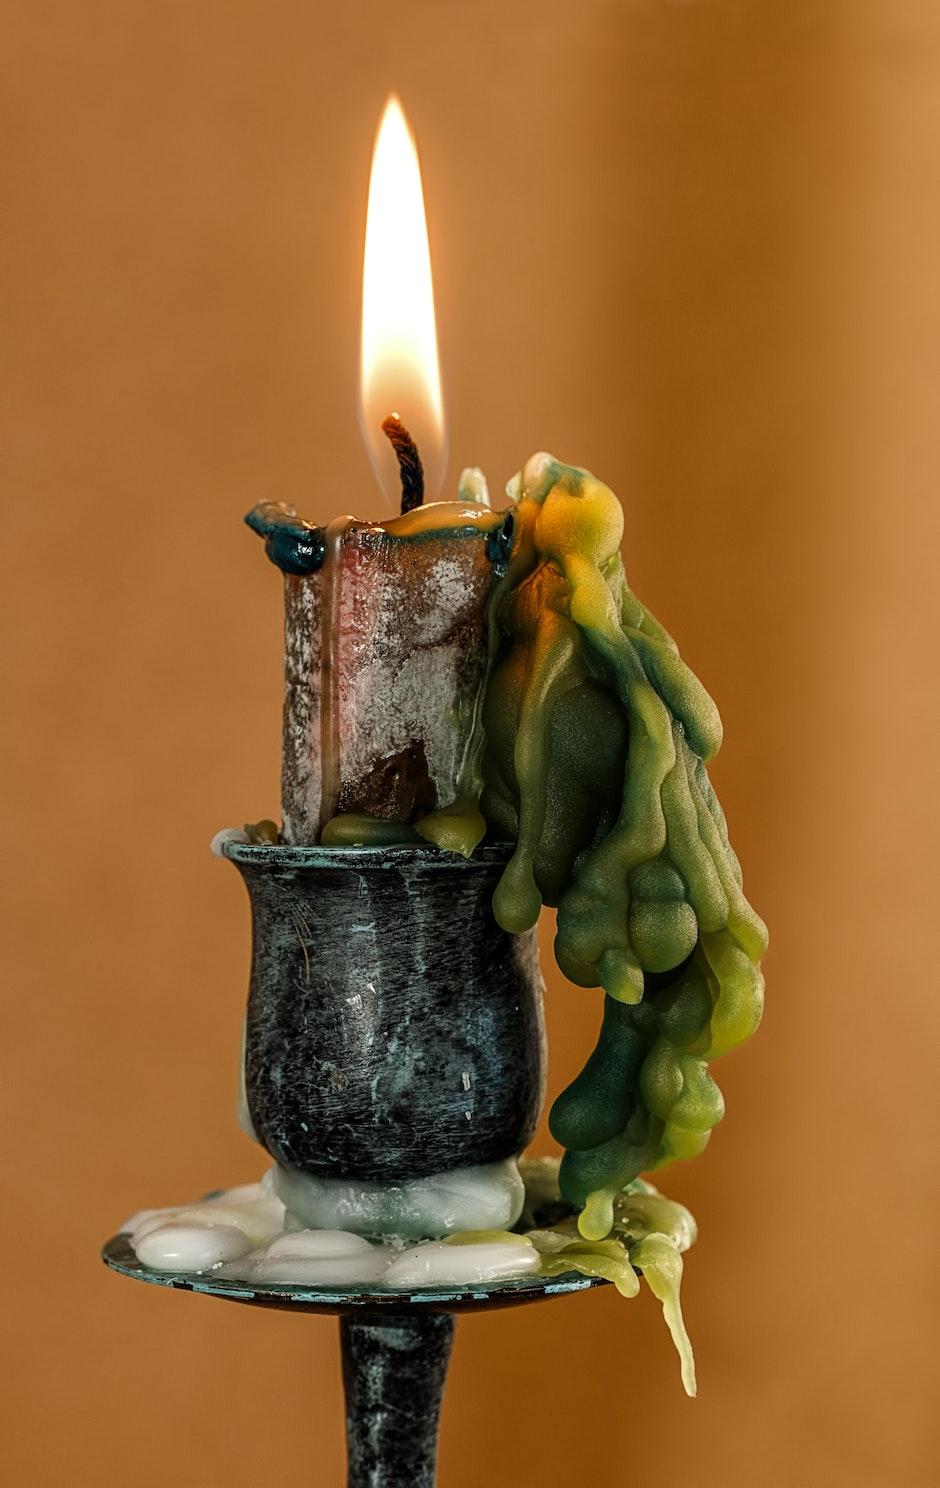 burning, candle, candle wax